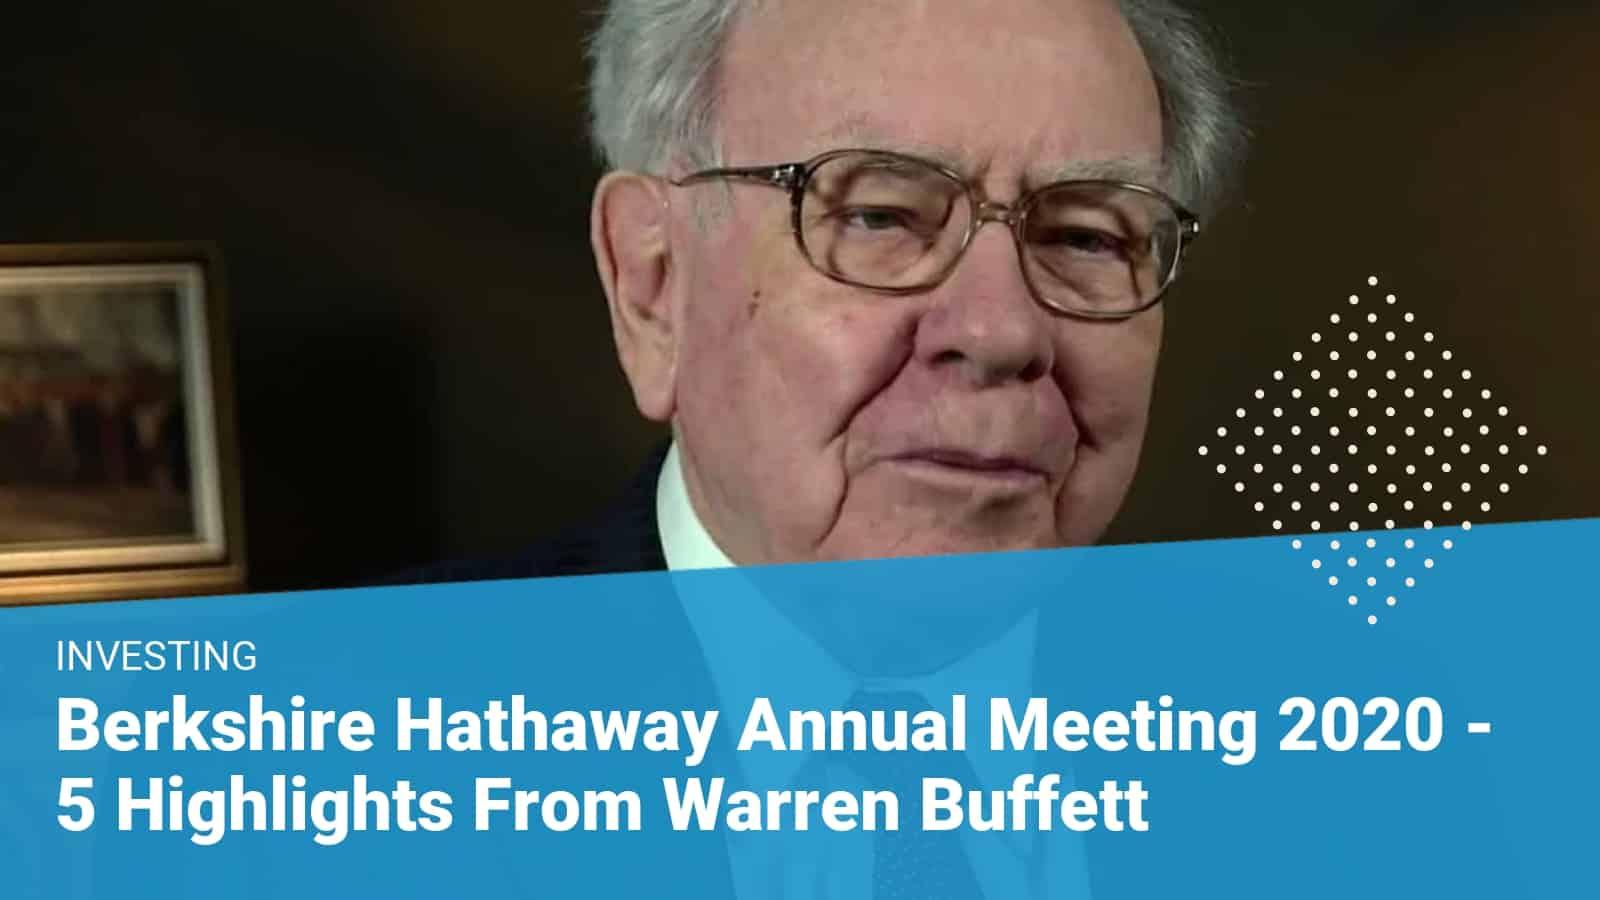 Berkshire Hathaway 2020 Annual Meeting